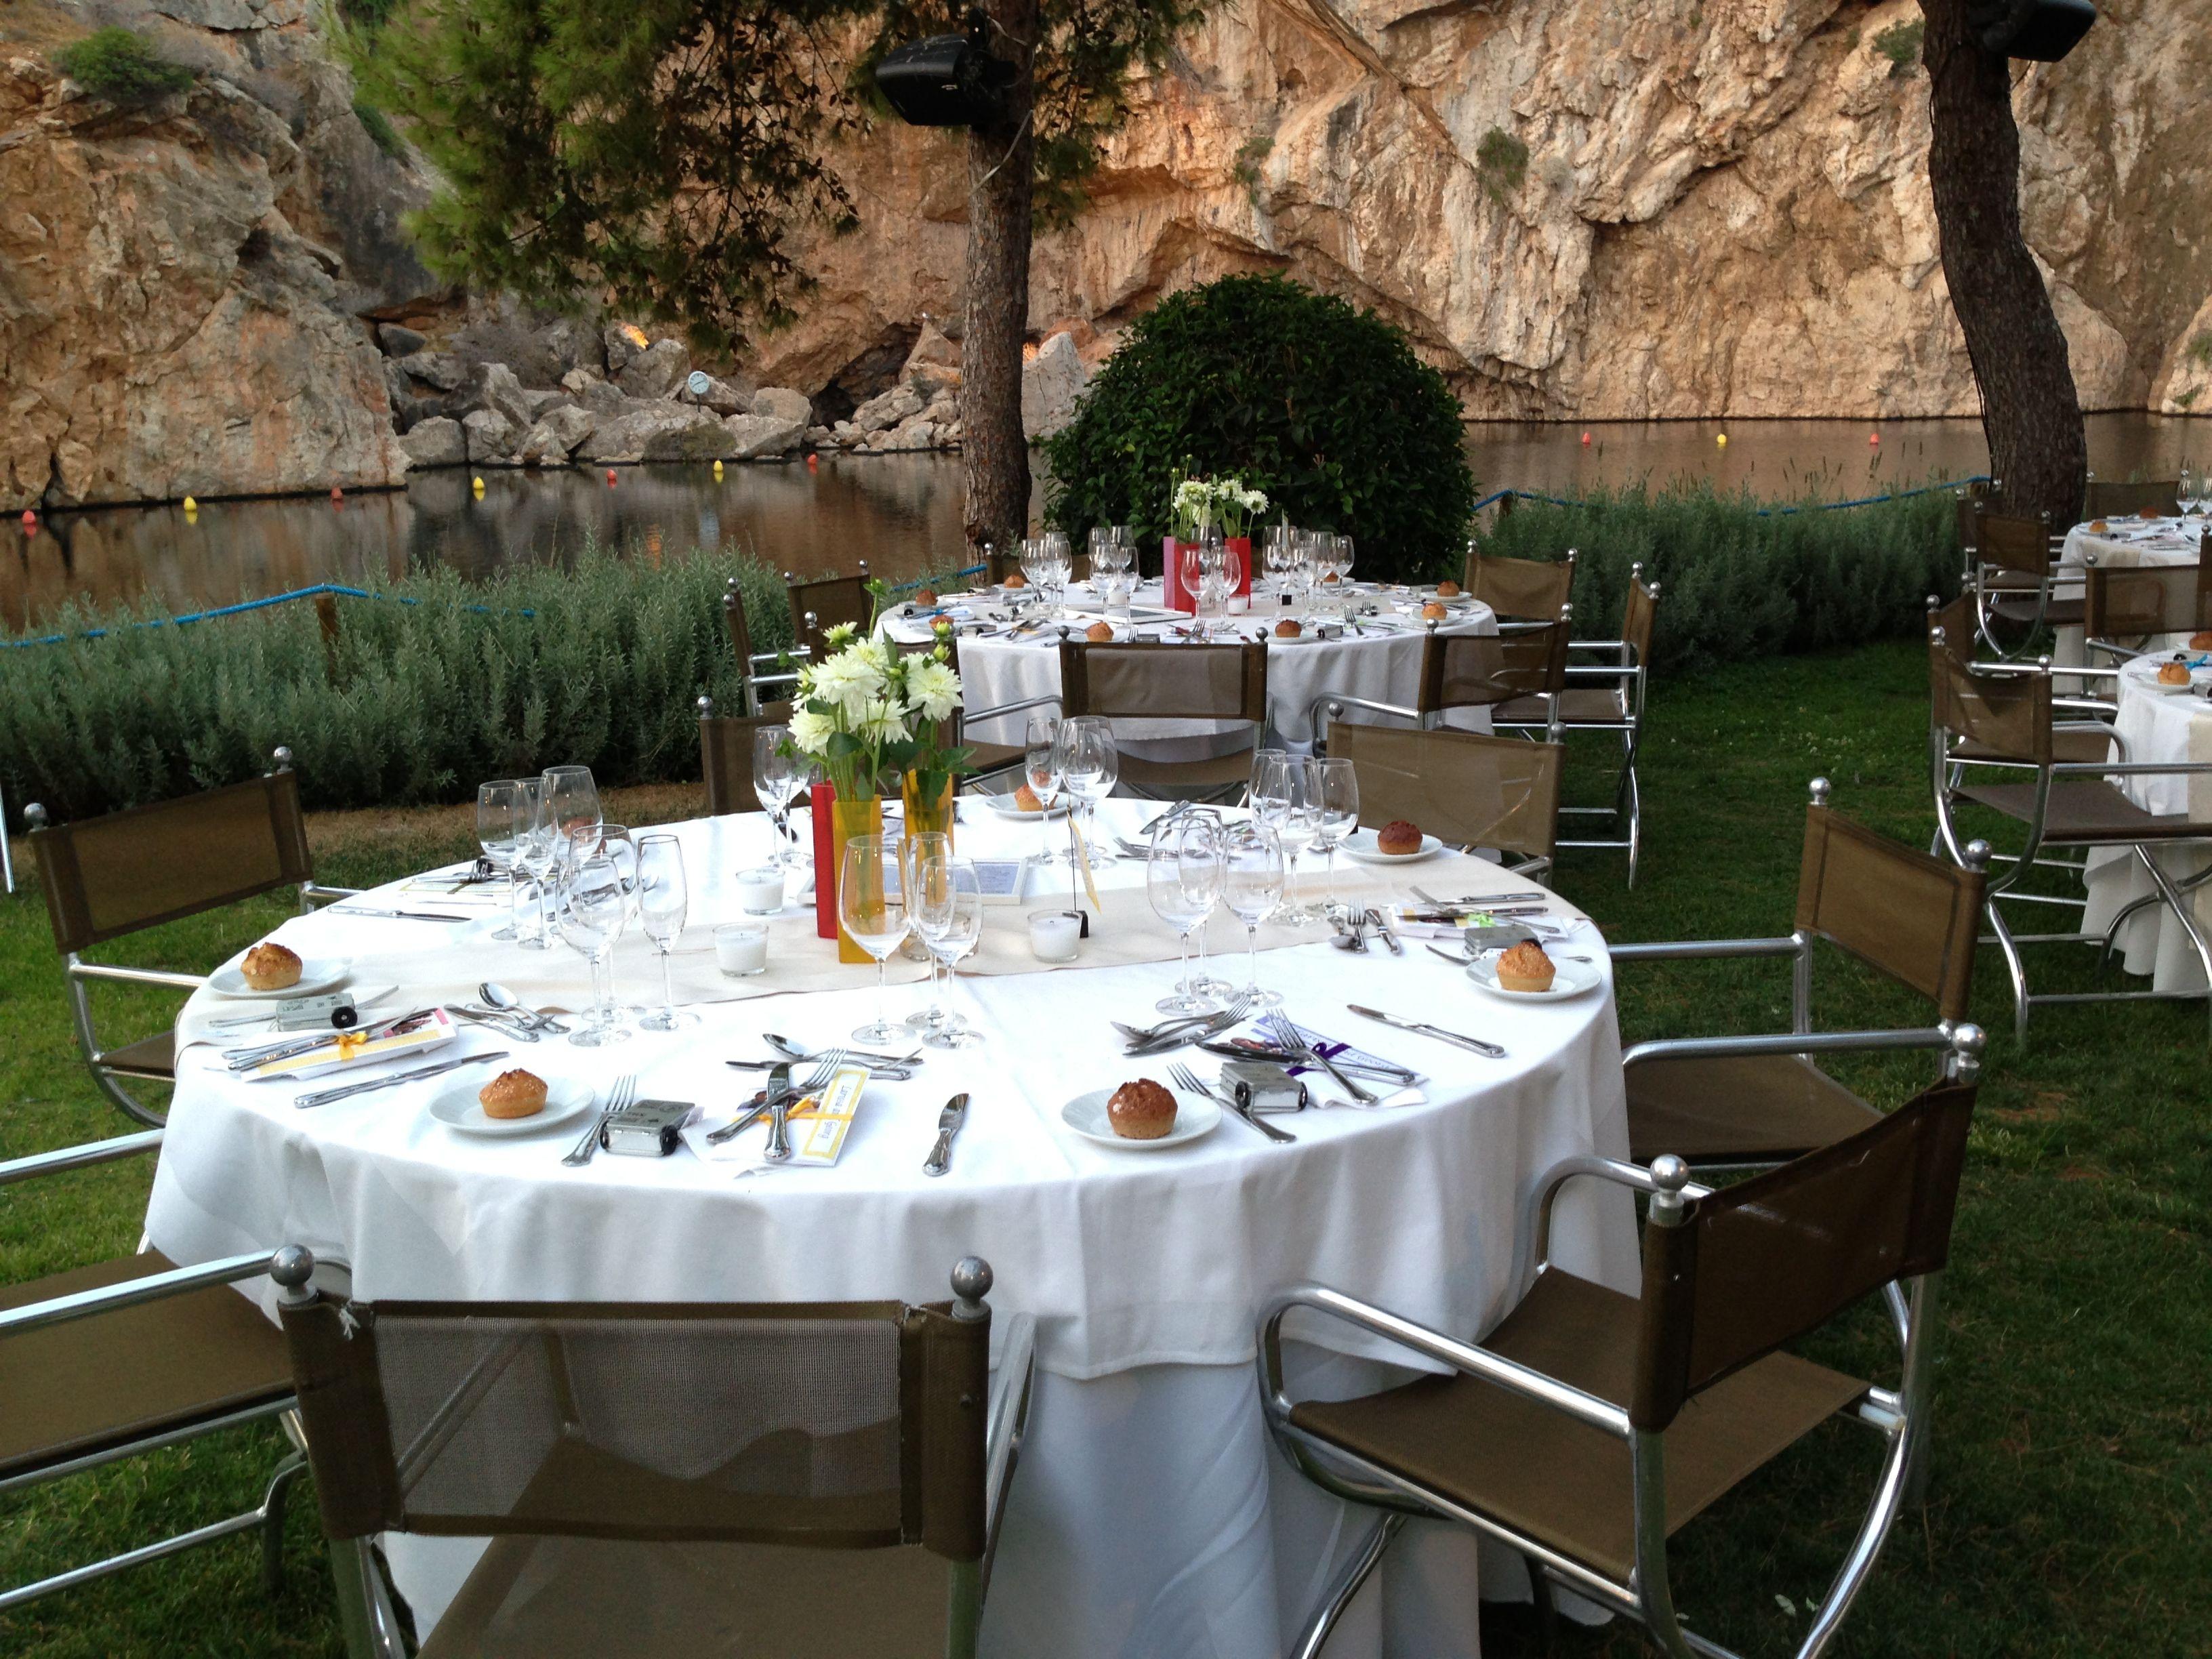 An elegant wedding reception set up in a lake in greece for a an elegant wedding reception set up in a lake in greece for a junglespirit Image collections